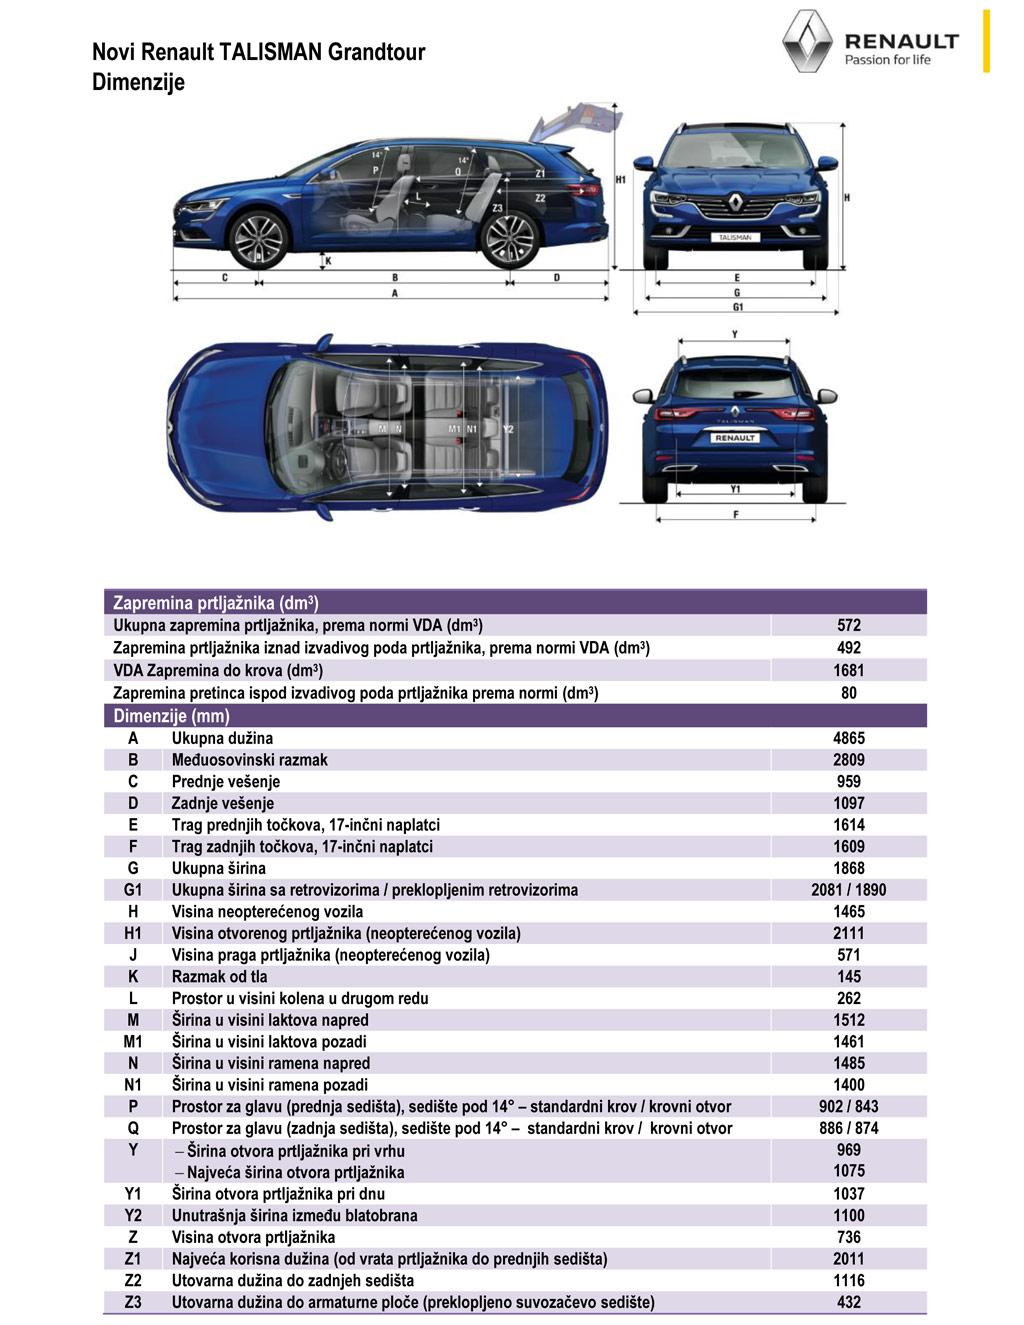 Renault Talisman Grandtour - dimenzije